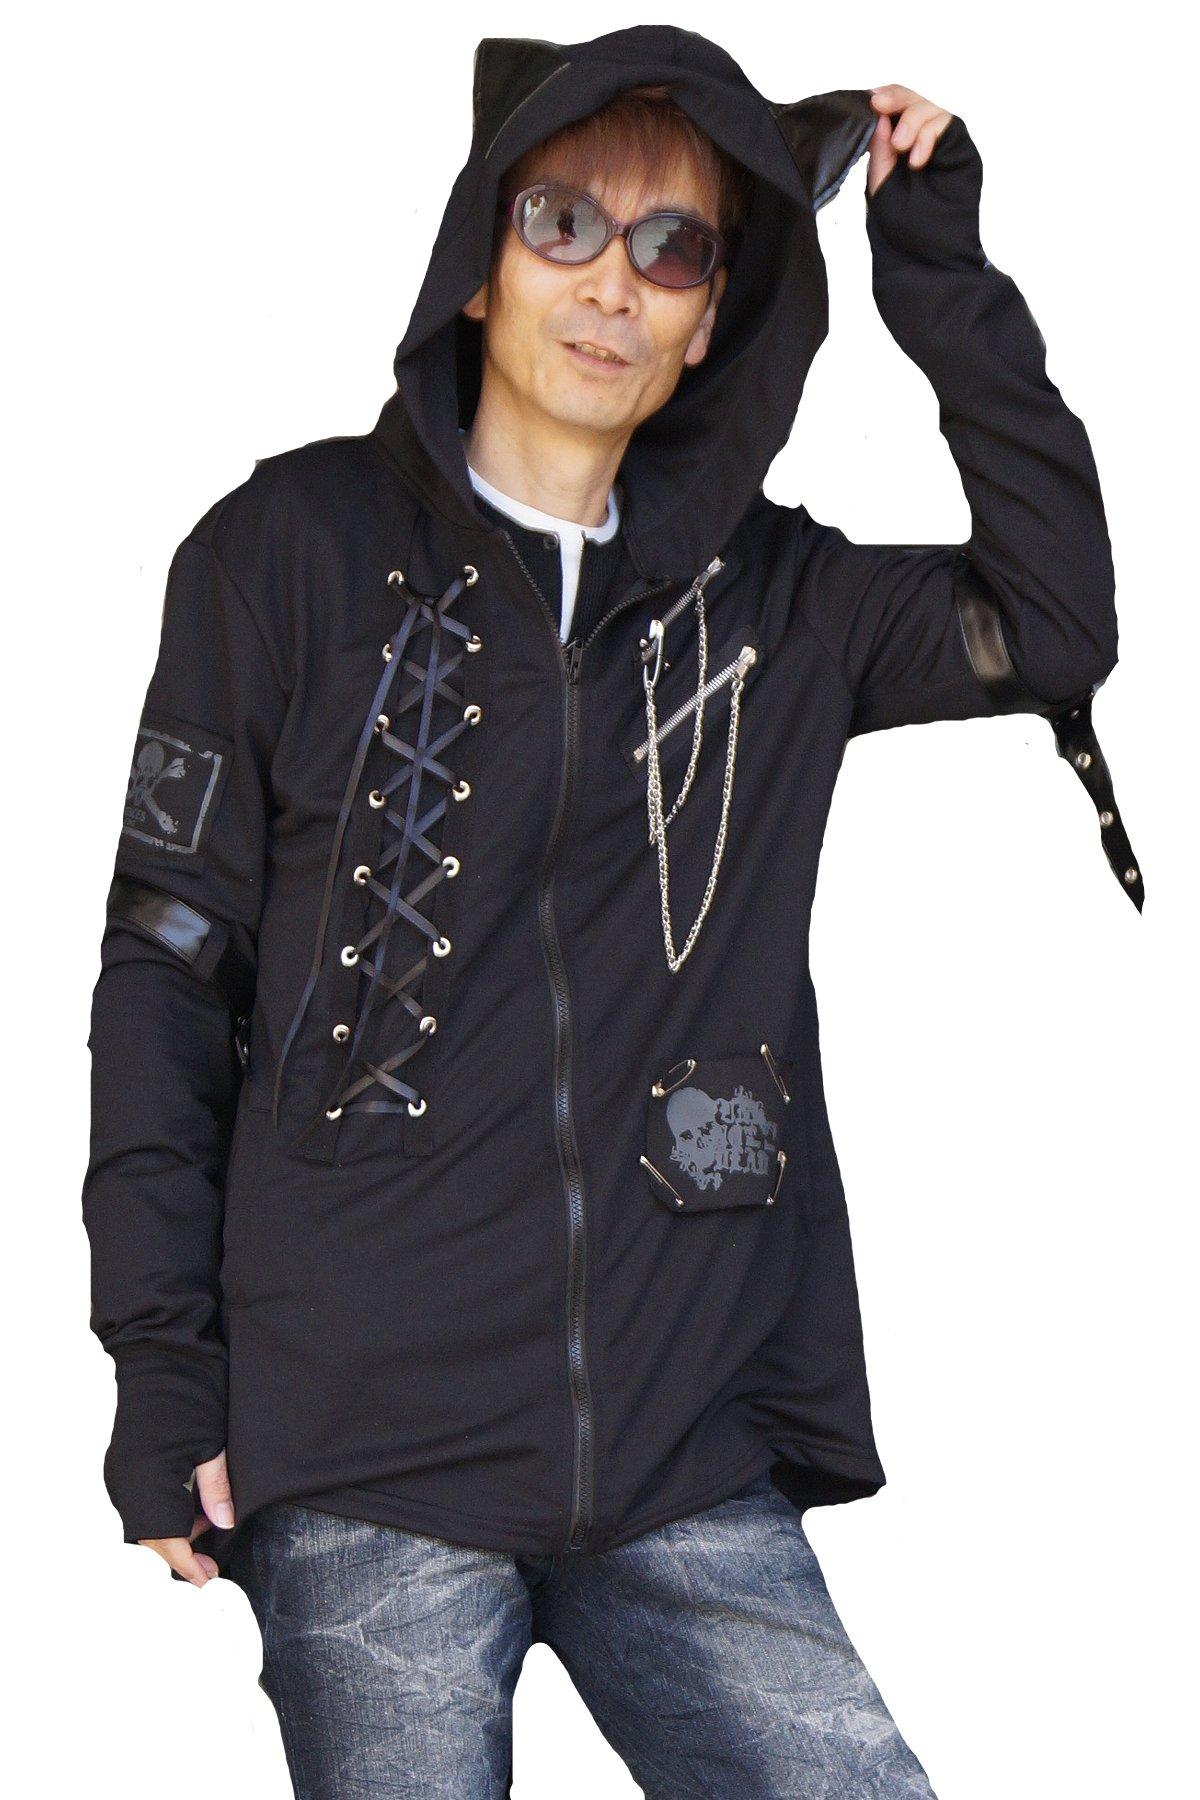 SWEF472 Kenny Rogers Womens Warm Hooded Sweatshirt Outwear Pocket Hoodie Long Sleeve Pullover